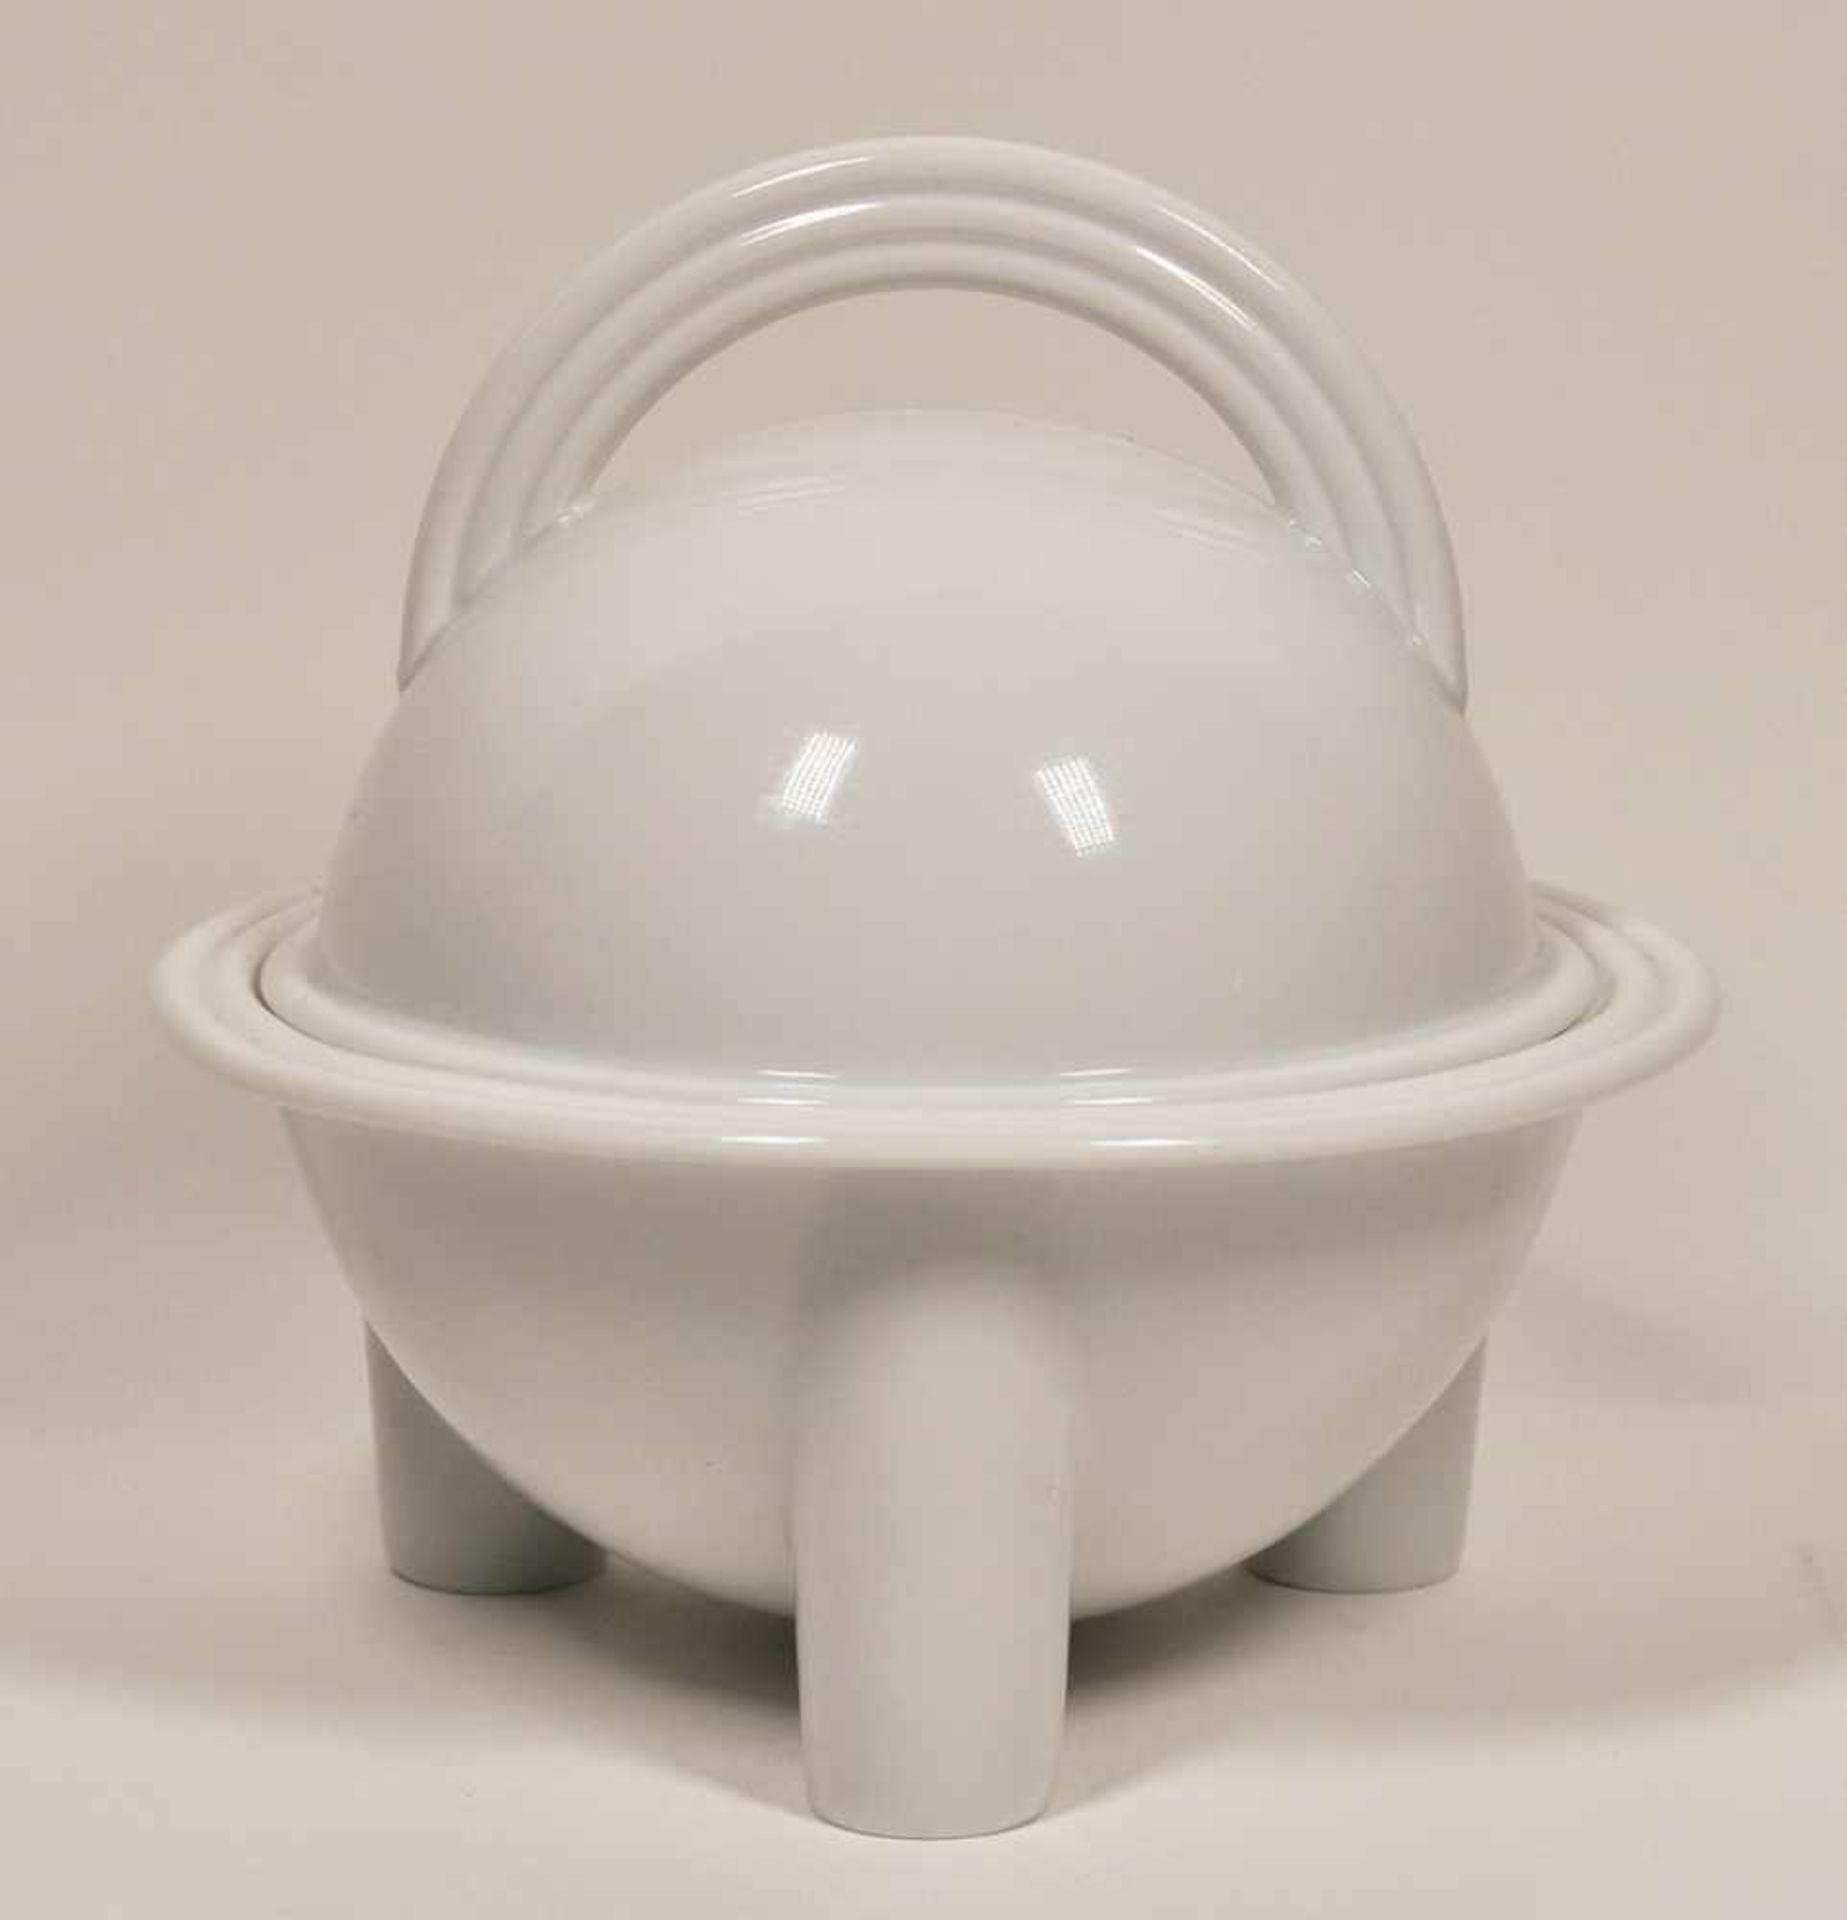 "Los 15 - Terrine, Rosenthal um 1950,""Cupola"", Entwurf von Mario Bellini, Dm 23,7 cm, Höhe 24 cm"